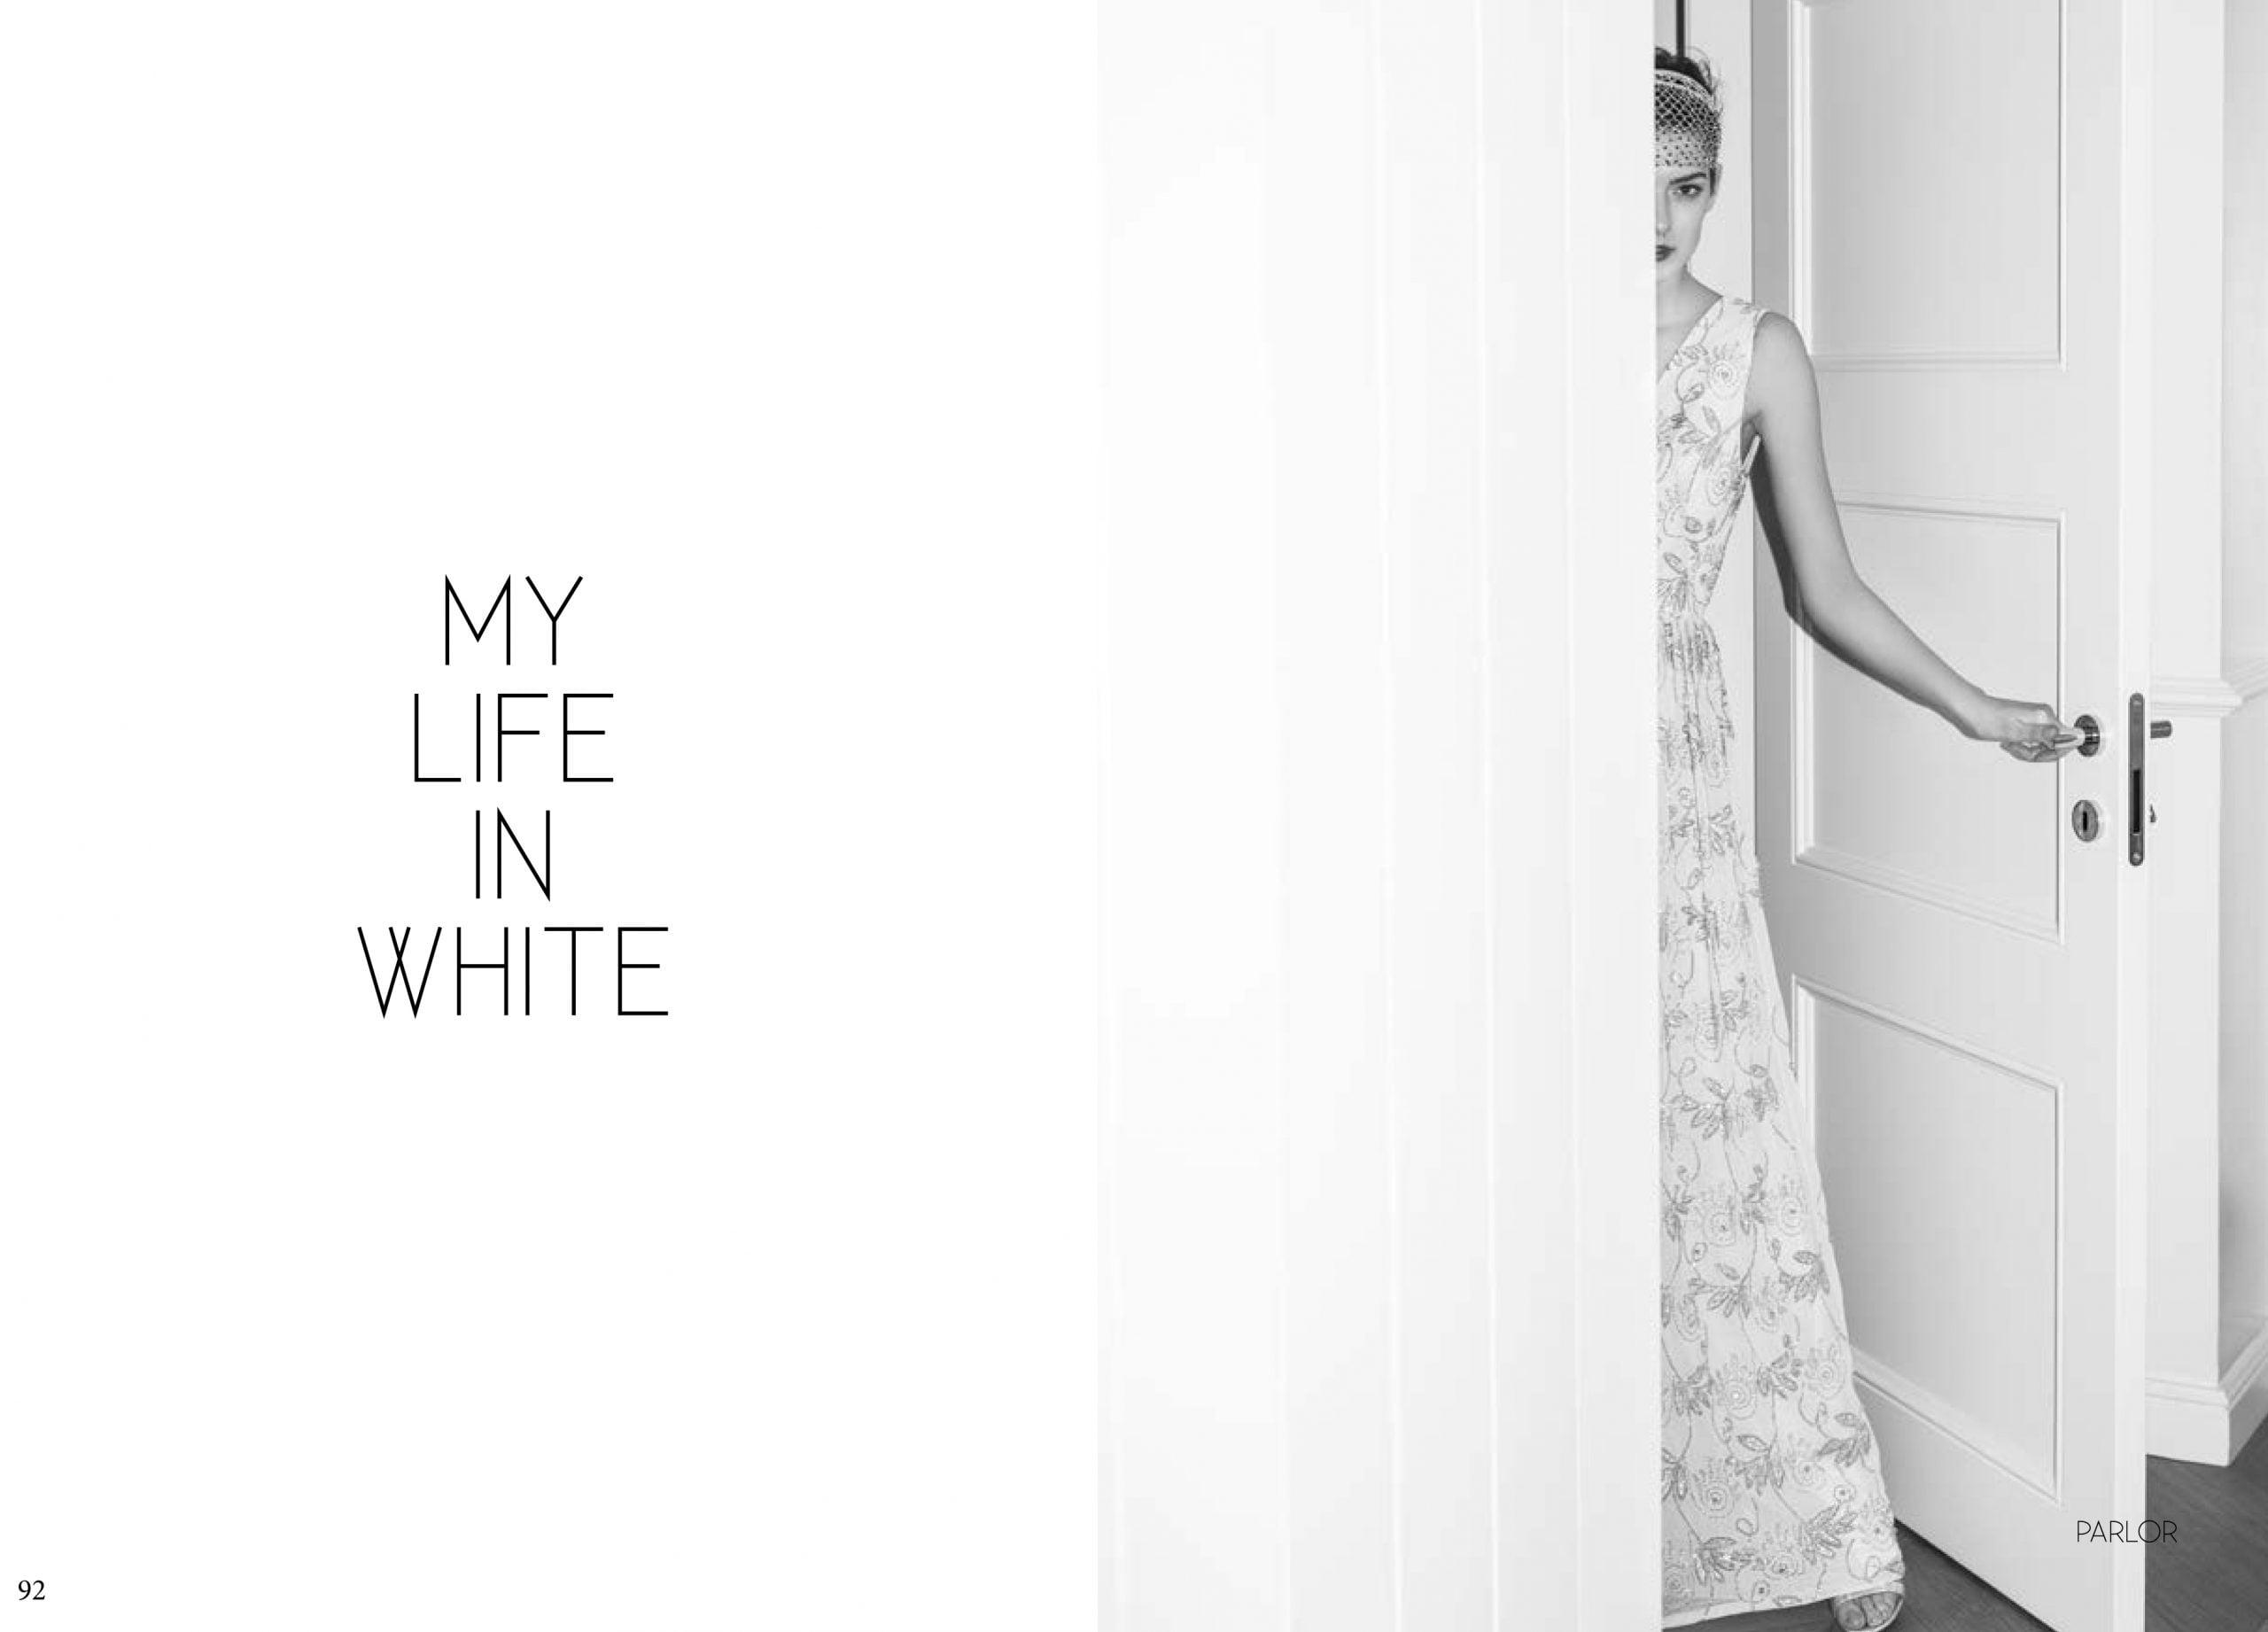 UFASHON BRIDAL. MY LIFE IN WHITE. 2017